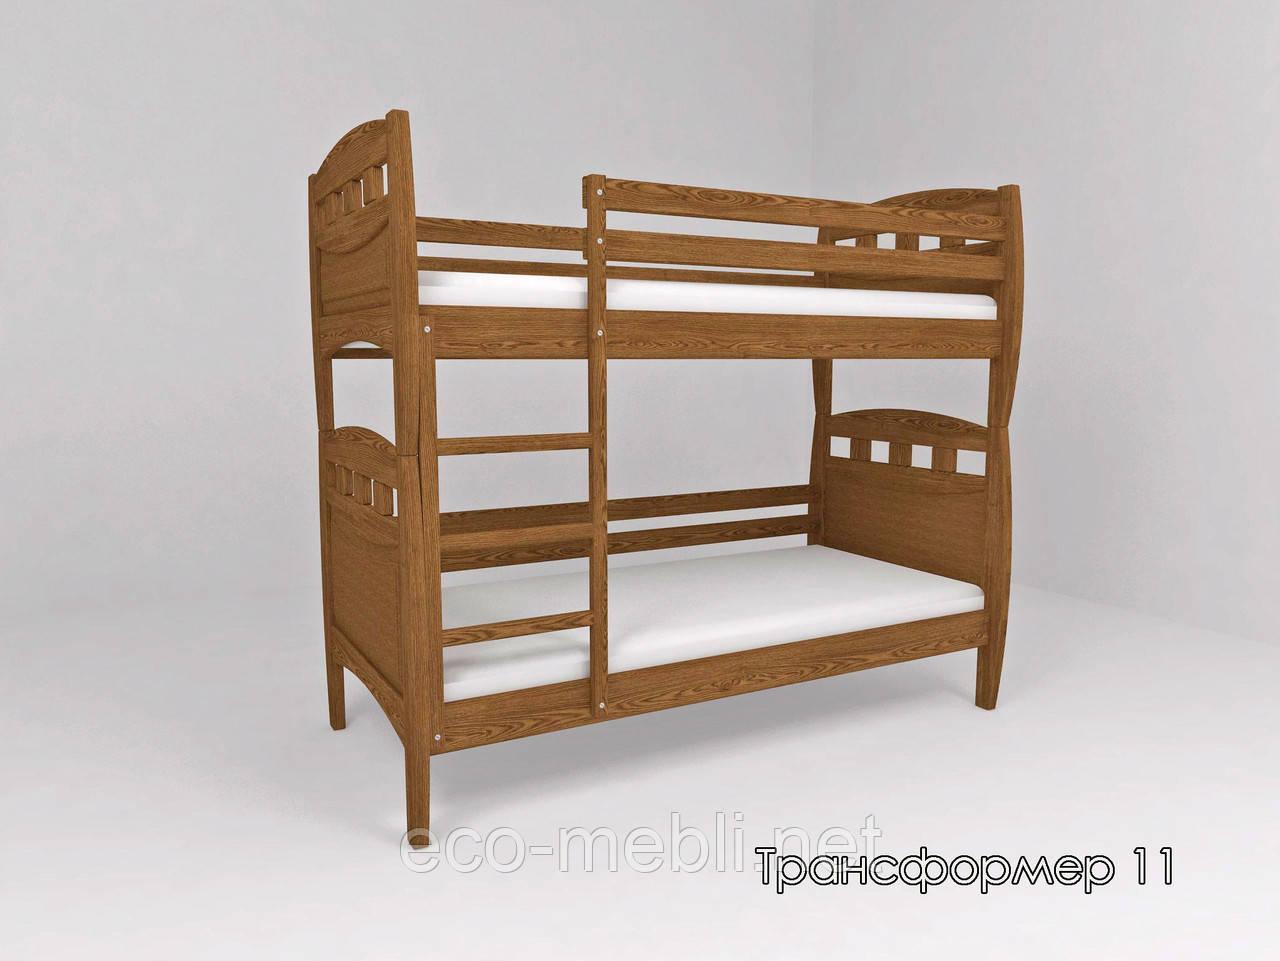 Ліжко ТИС Трансформер 11 (Сосна, Бук, Дуб)